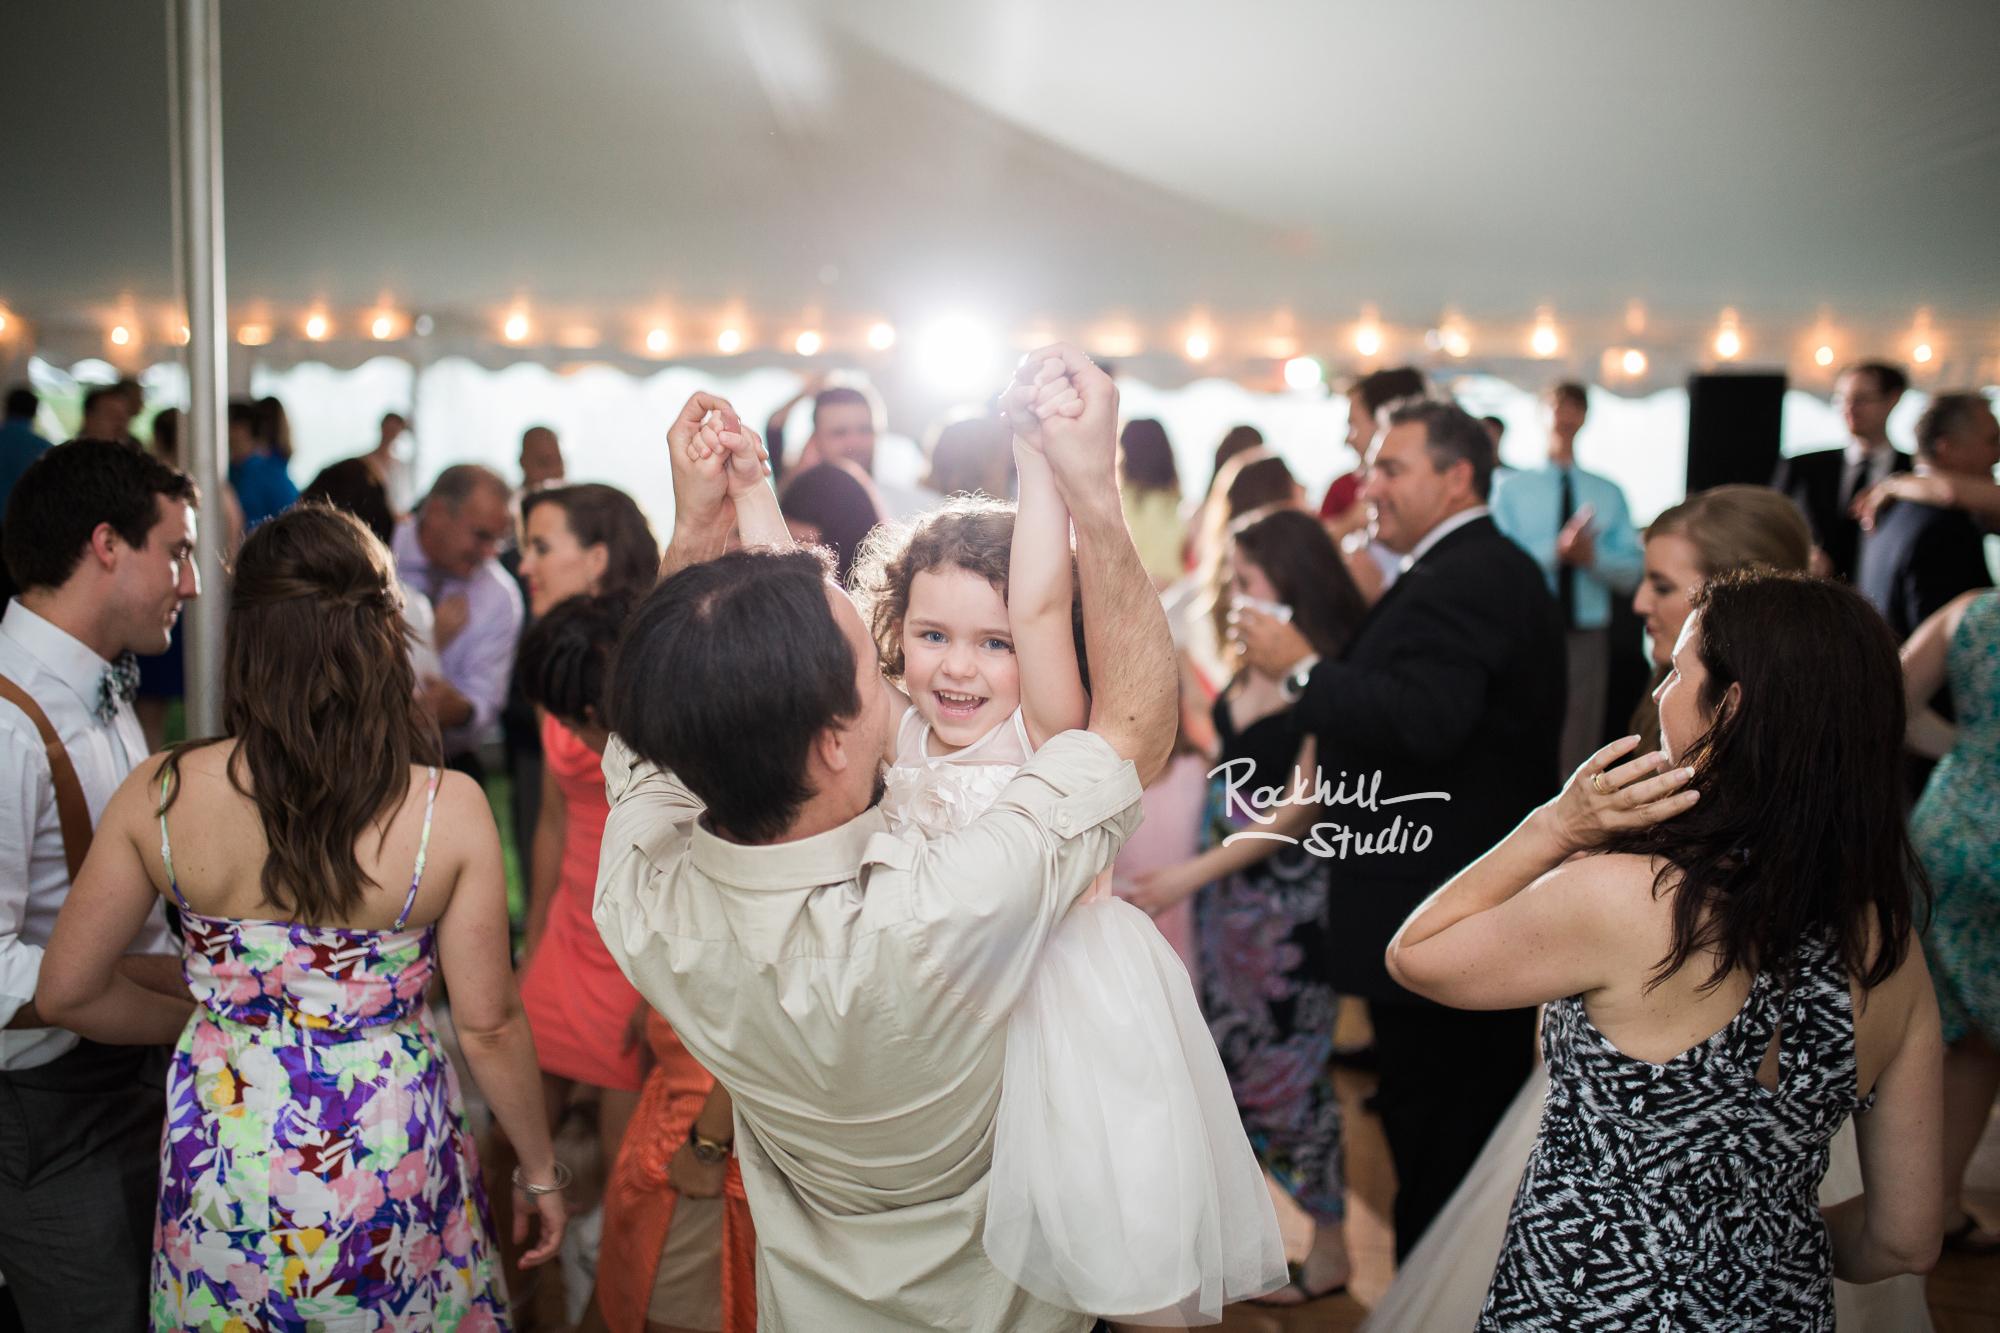 marquette-michigan-wedding-upper-peninsula-spring-photography-rockhill-ee-79.jpg